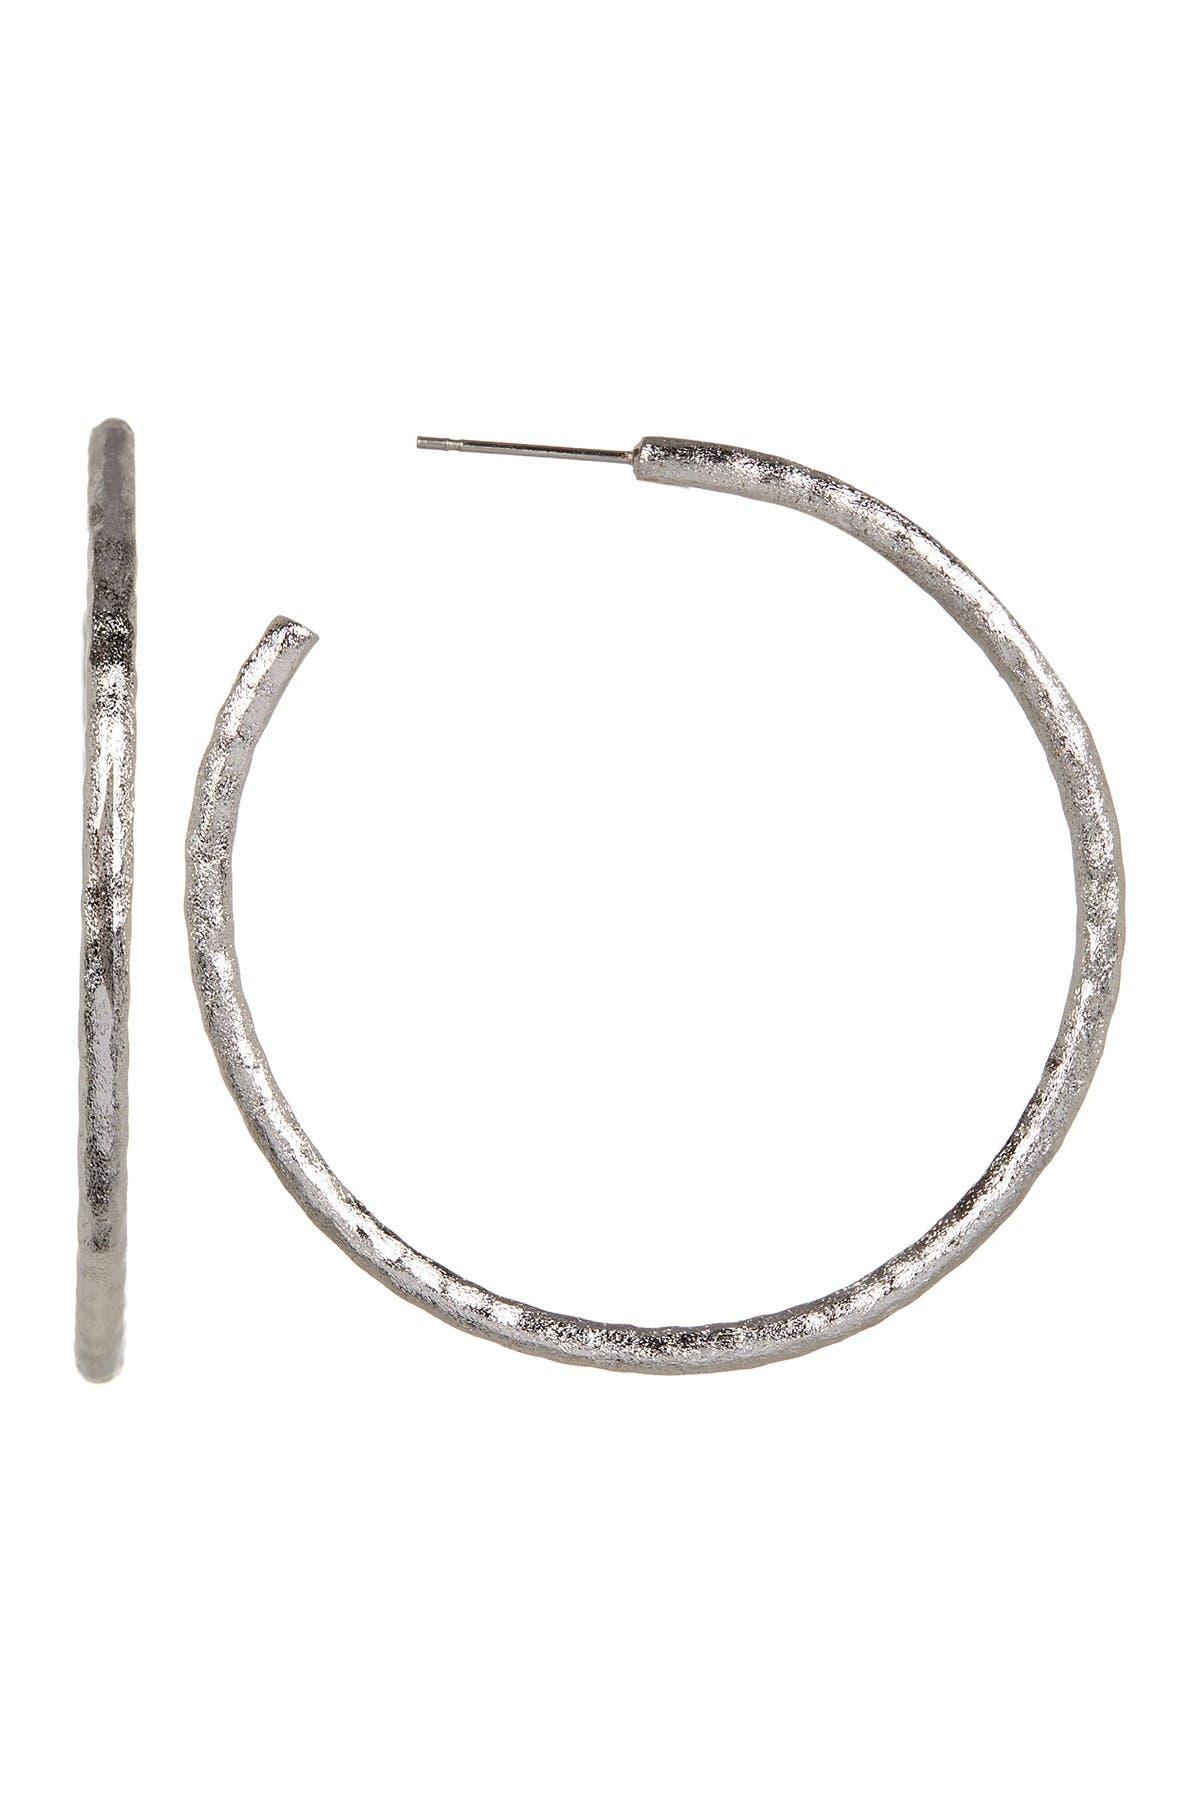 Image of Rivka Friedman White Rhodium Clad Hammered Satin Post Hoop Earrings